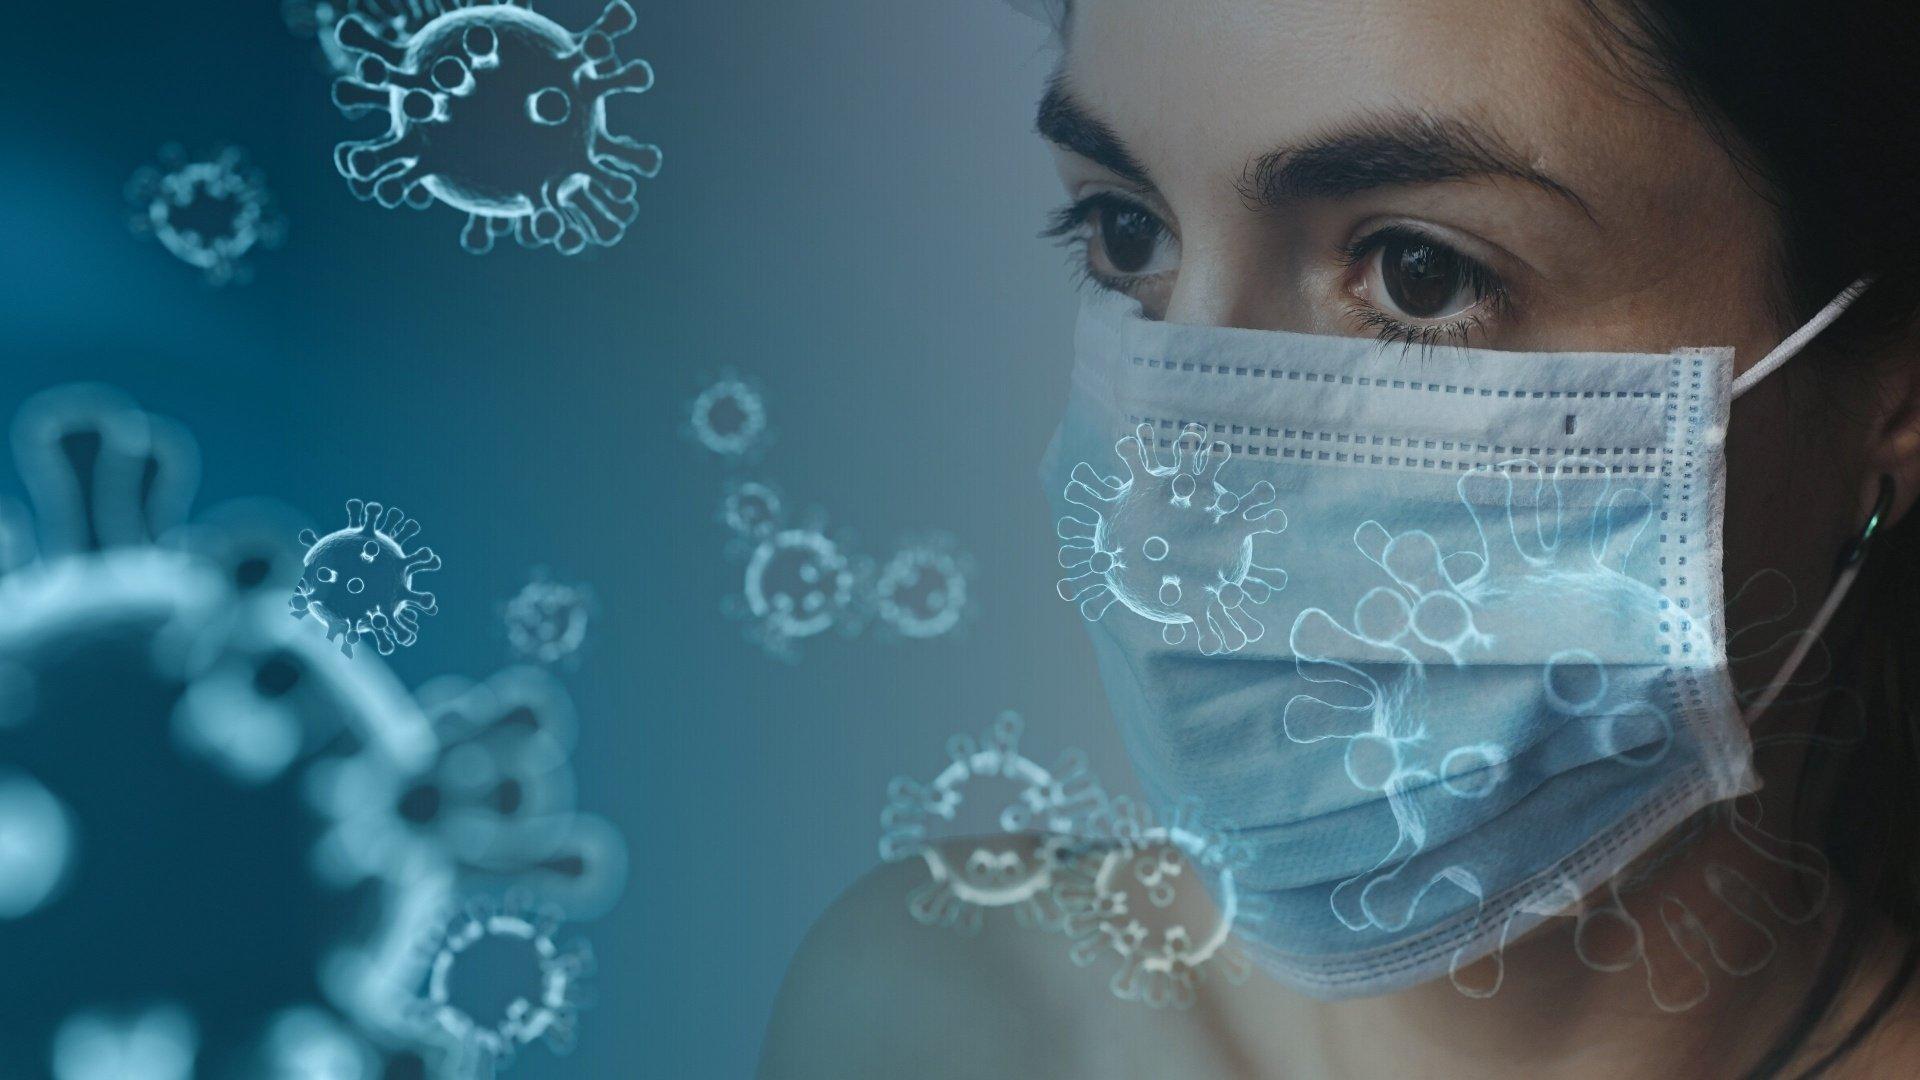 2020 Antiviral Development for COVID-19 Grant Opportunity